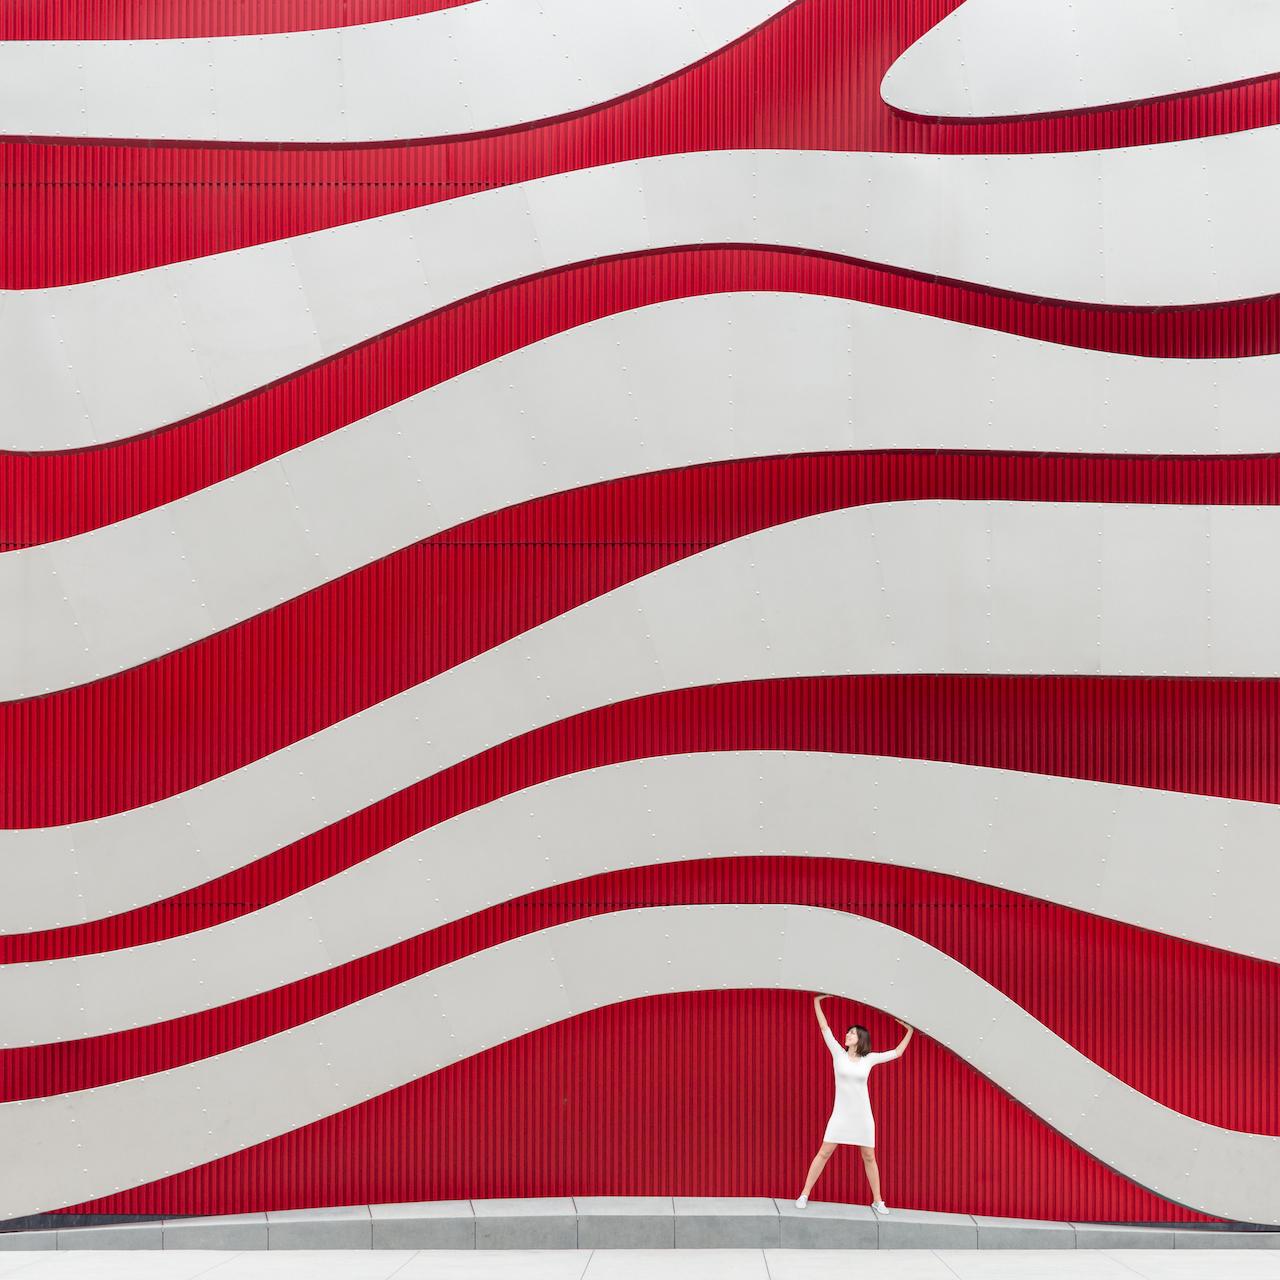 Annandaniel Anniset DrCuerda Anna Devís Daniel Rueda Curiocities Strong Red Los Angeles USA Petersen Automotive Museum